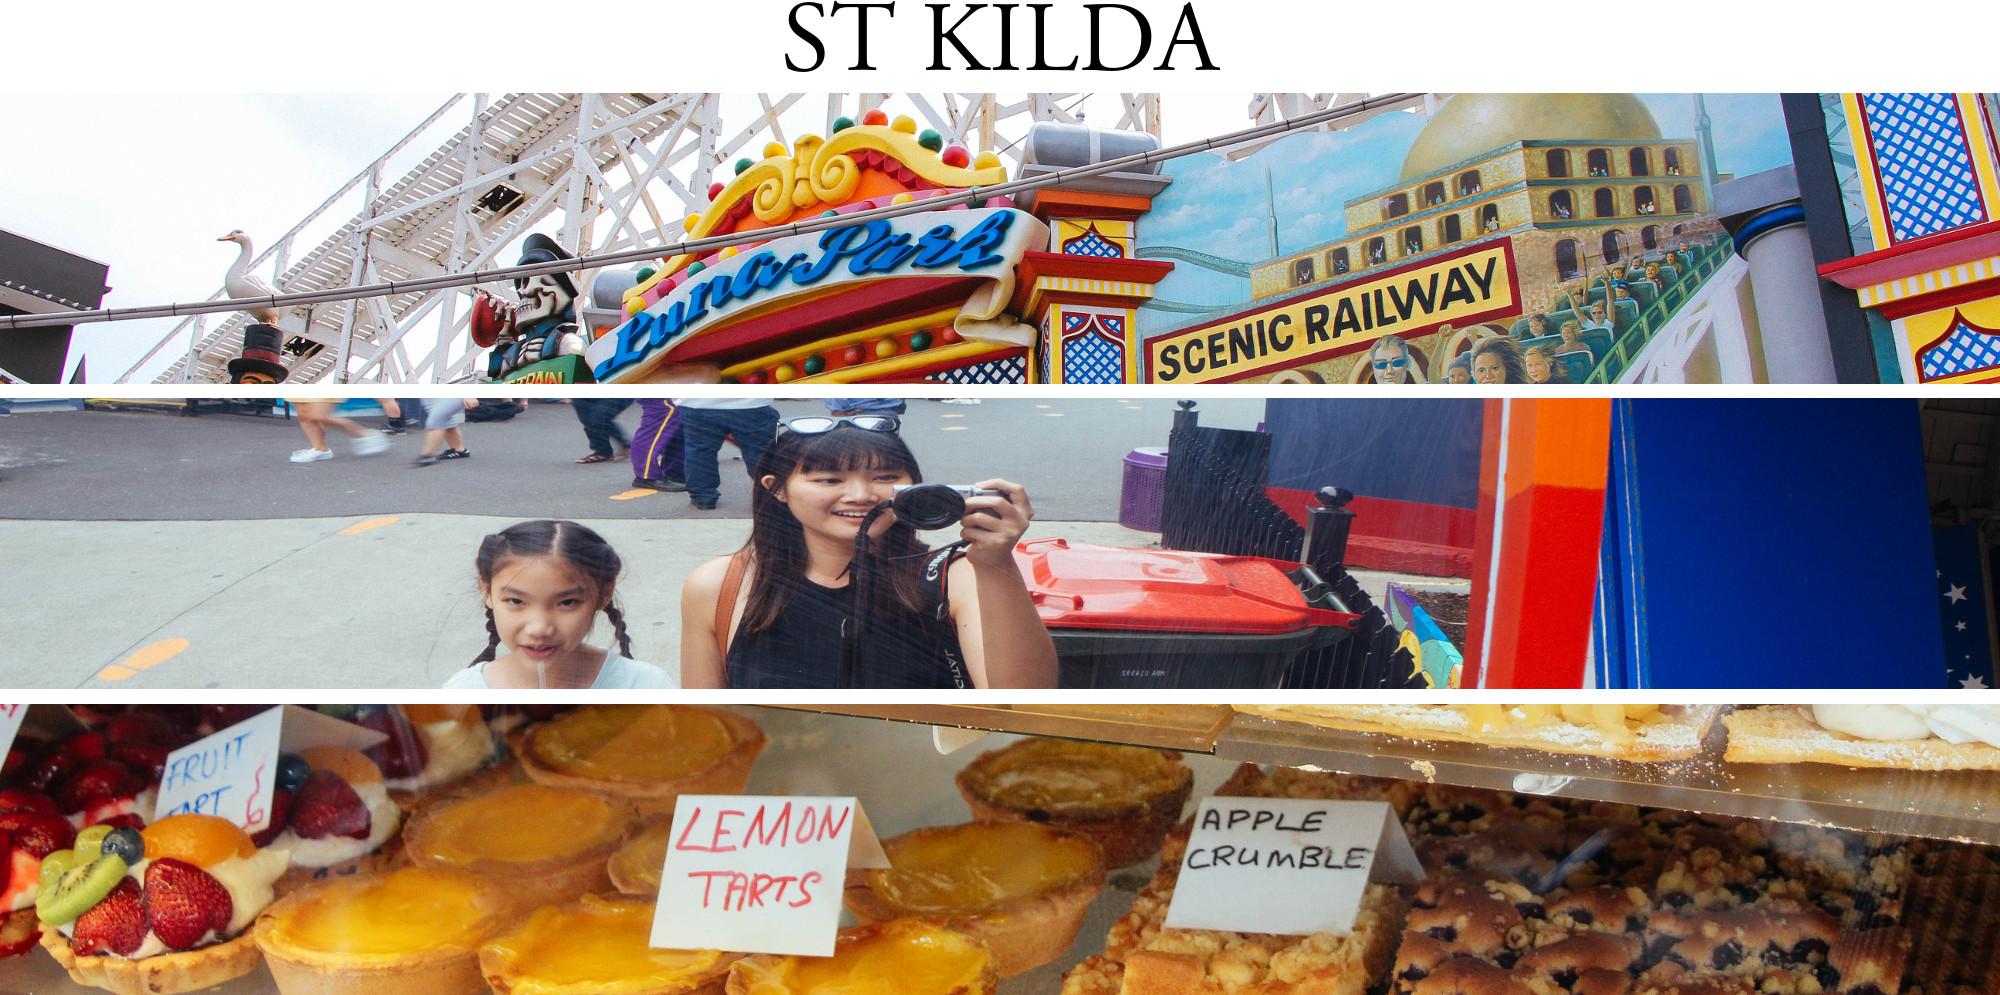 St Kilda Melbourne Australia City Guide